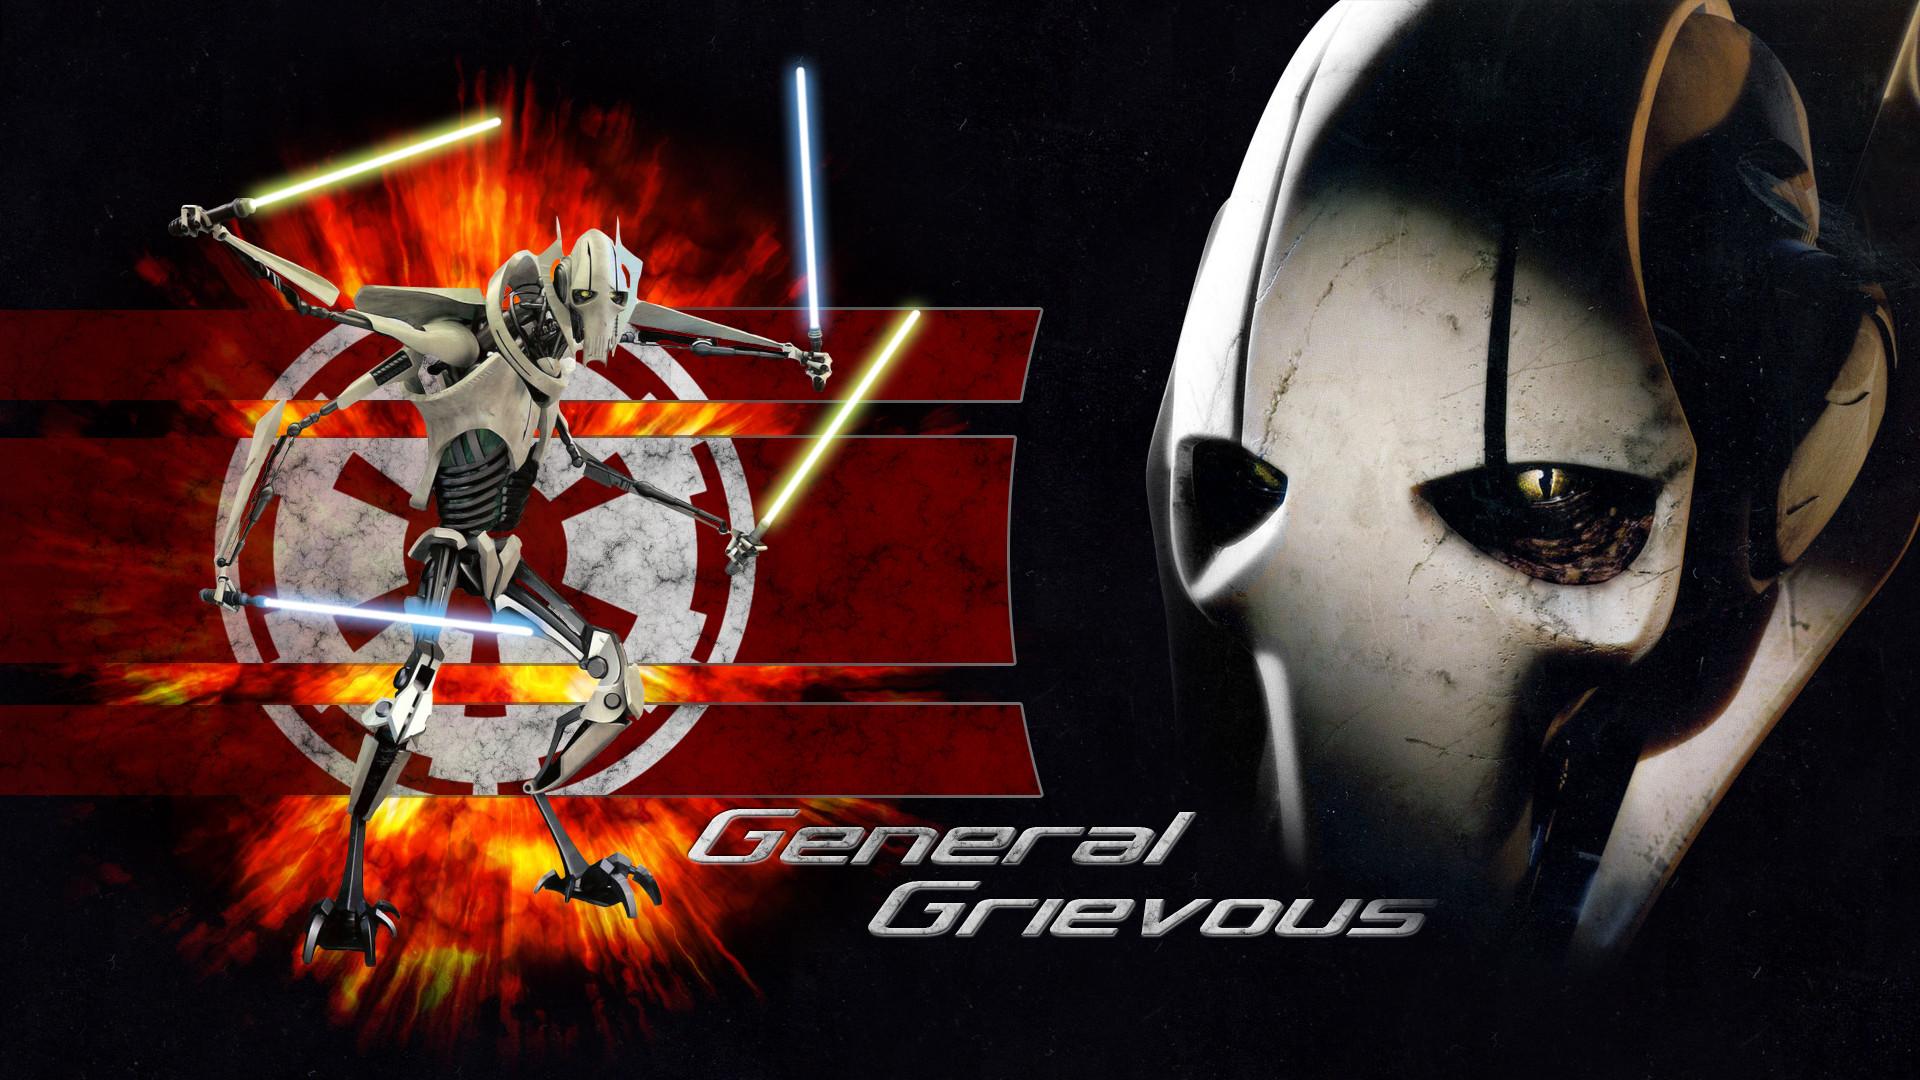 … Star Wars – General Grievous by TheSumu